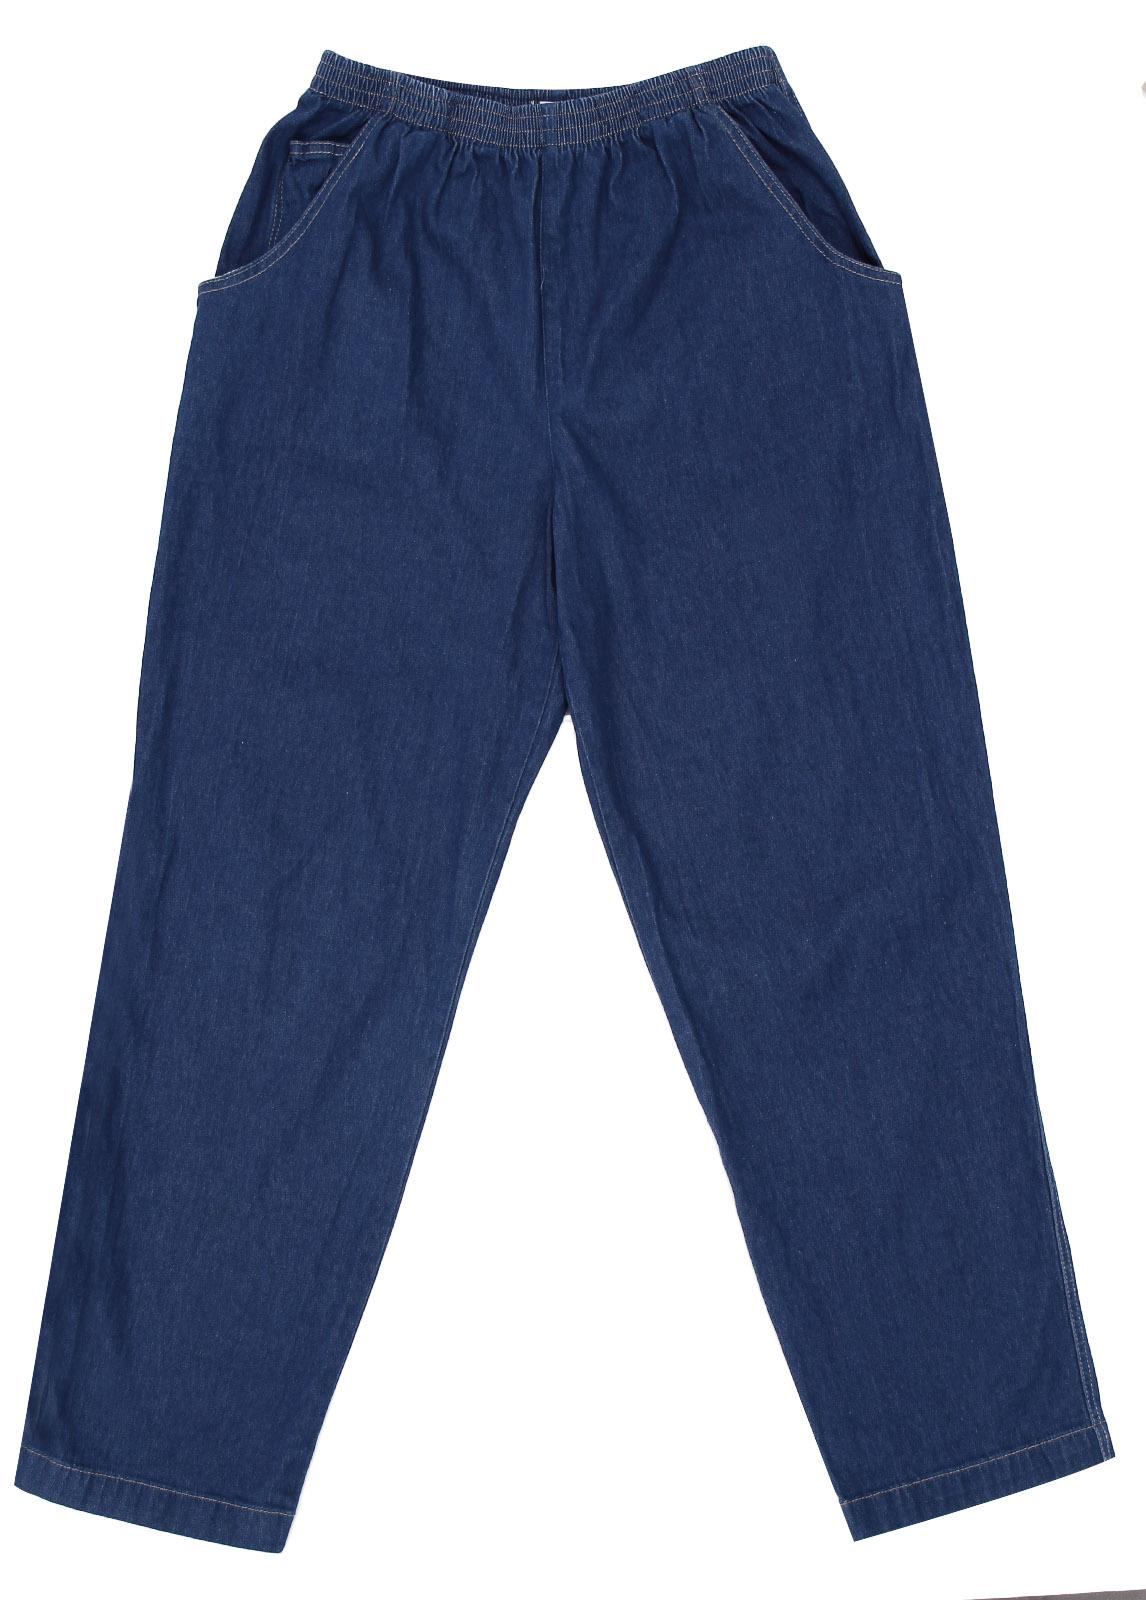 Amazing Women Casual Pants Denim Trousers Wide Leg Pants With Elastic Waist